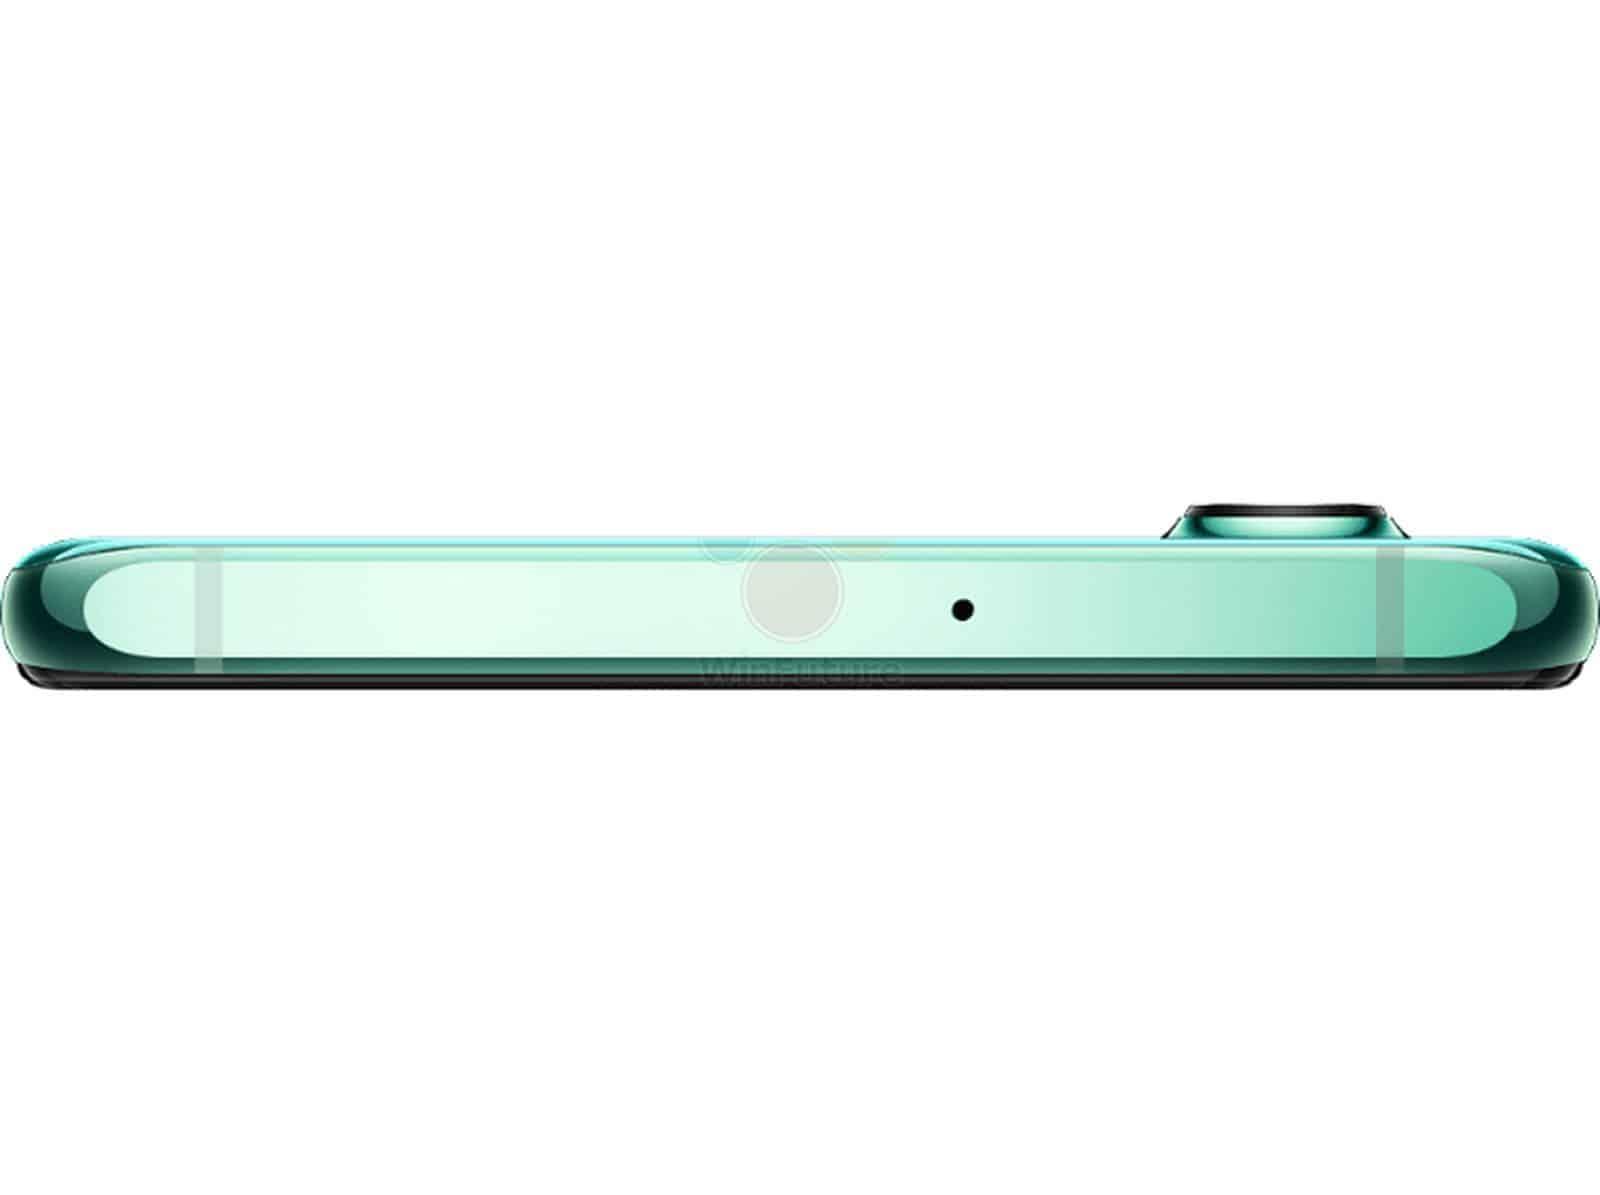 Huawei P30 top side leak 1